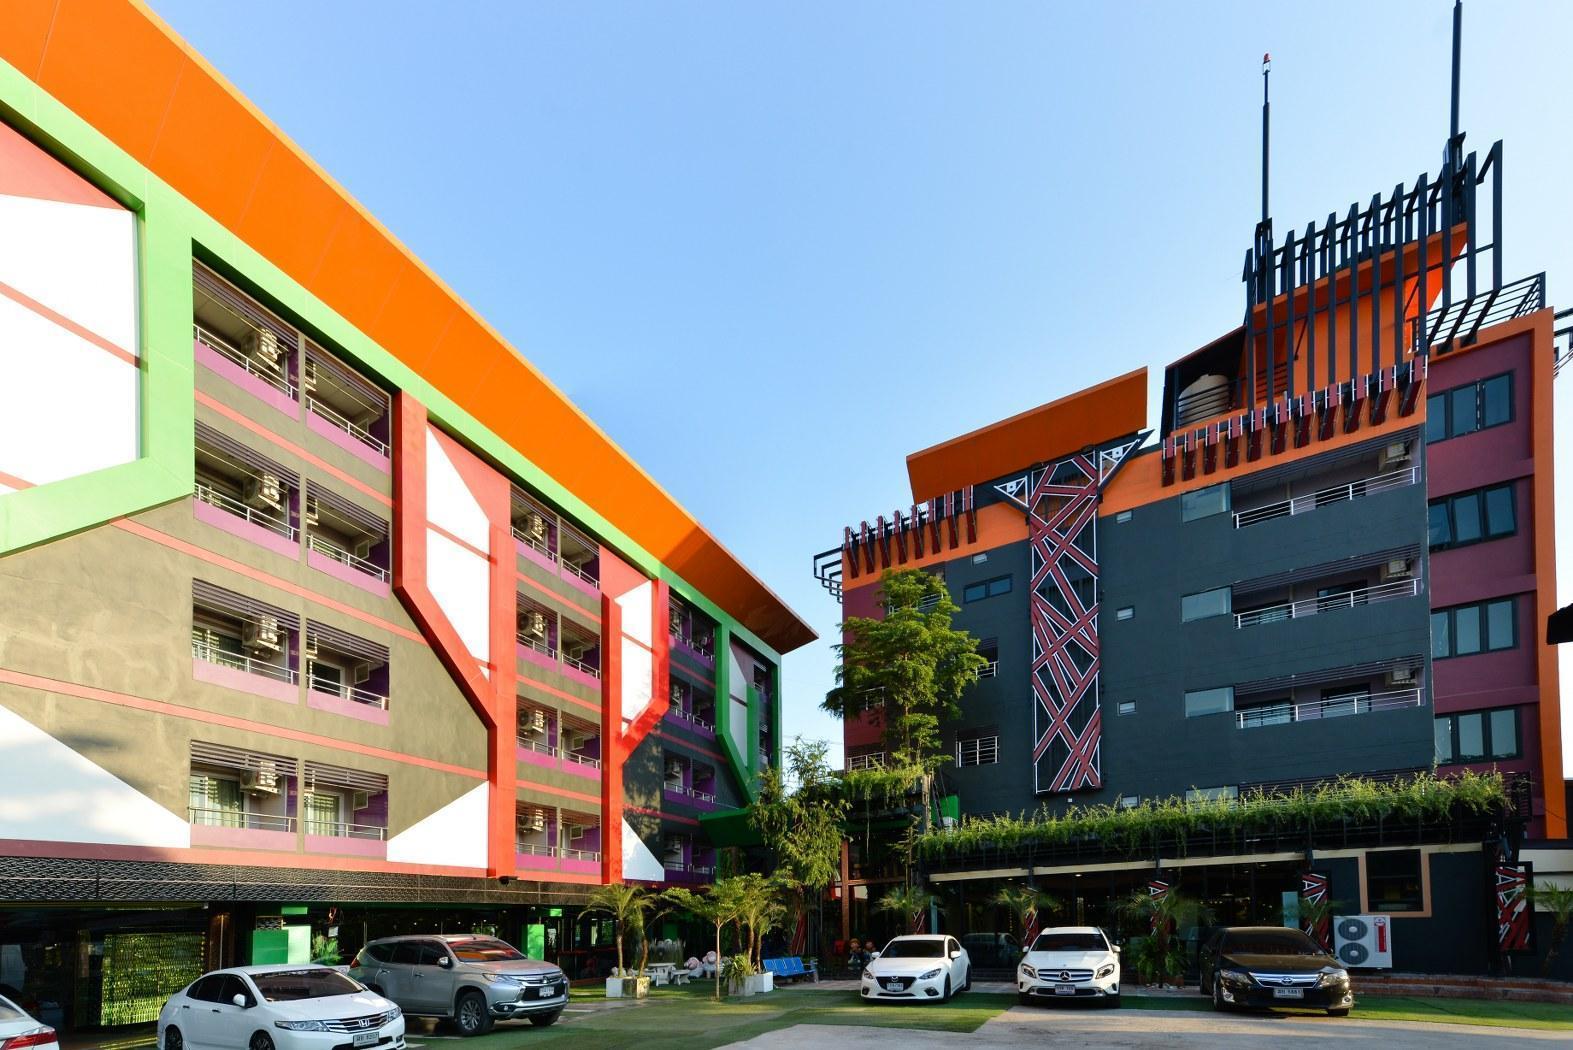 Media Hotel & Residence Bangkok มีเดีย โฮเต็ล แอนด์ เรสซิเดนซ์ กรุงเทพฯ